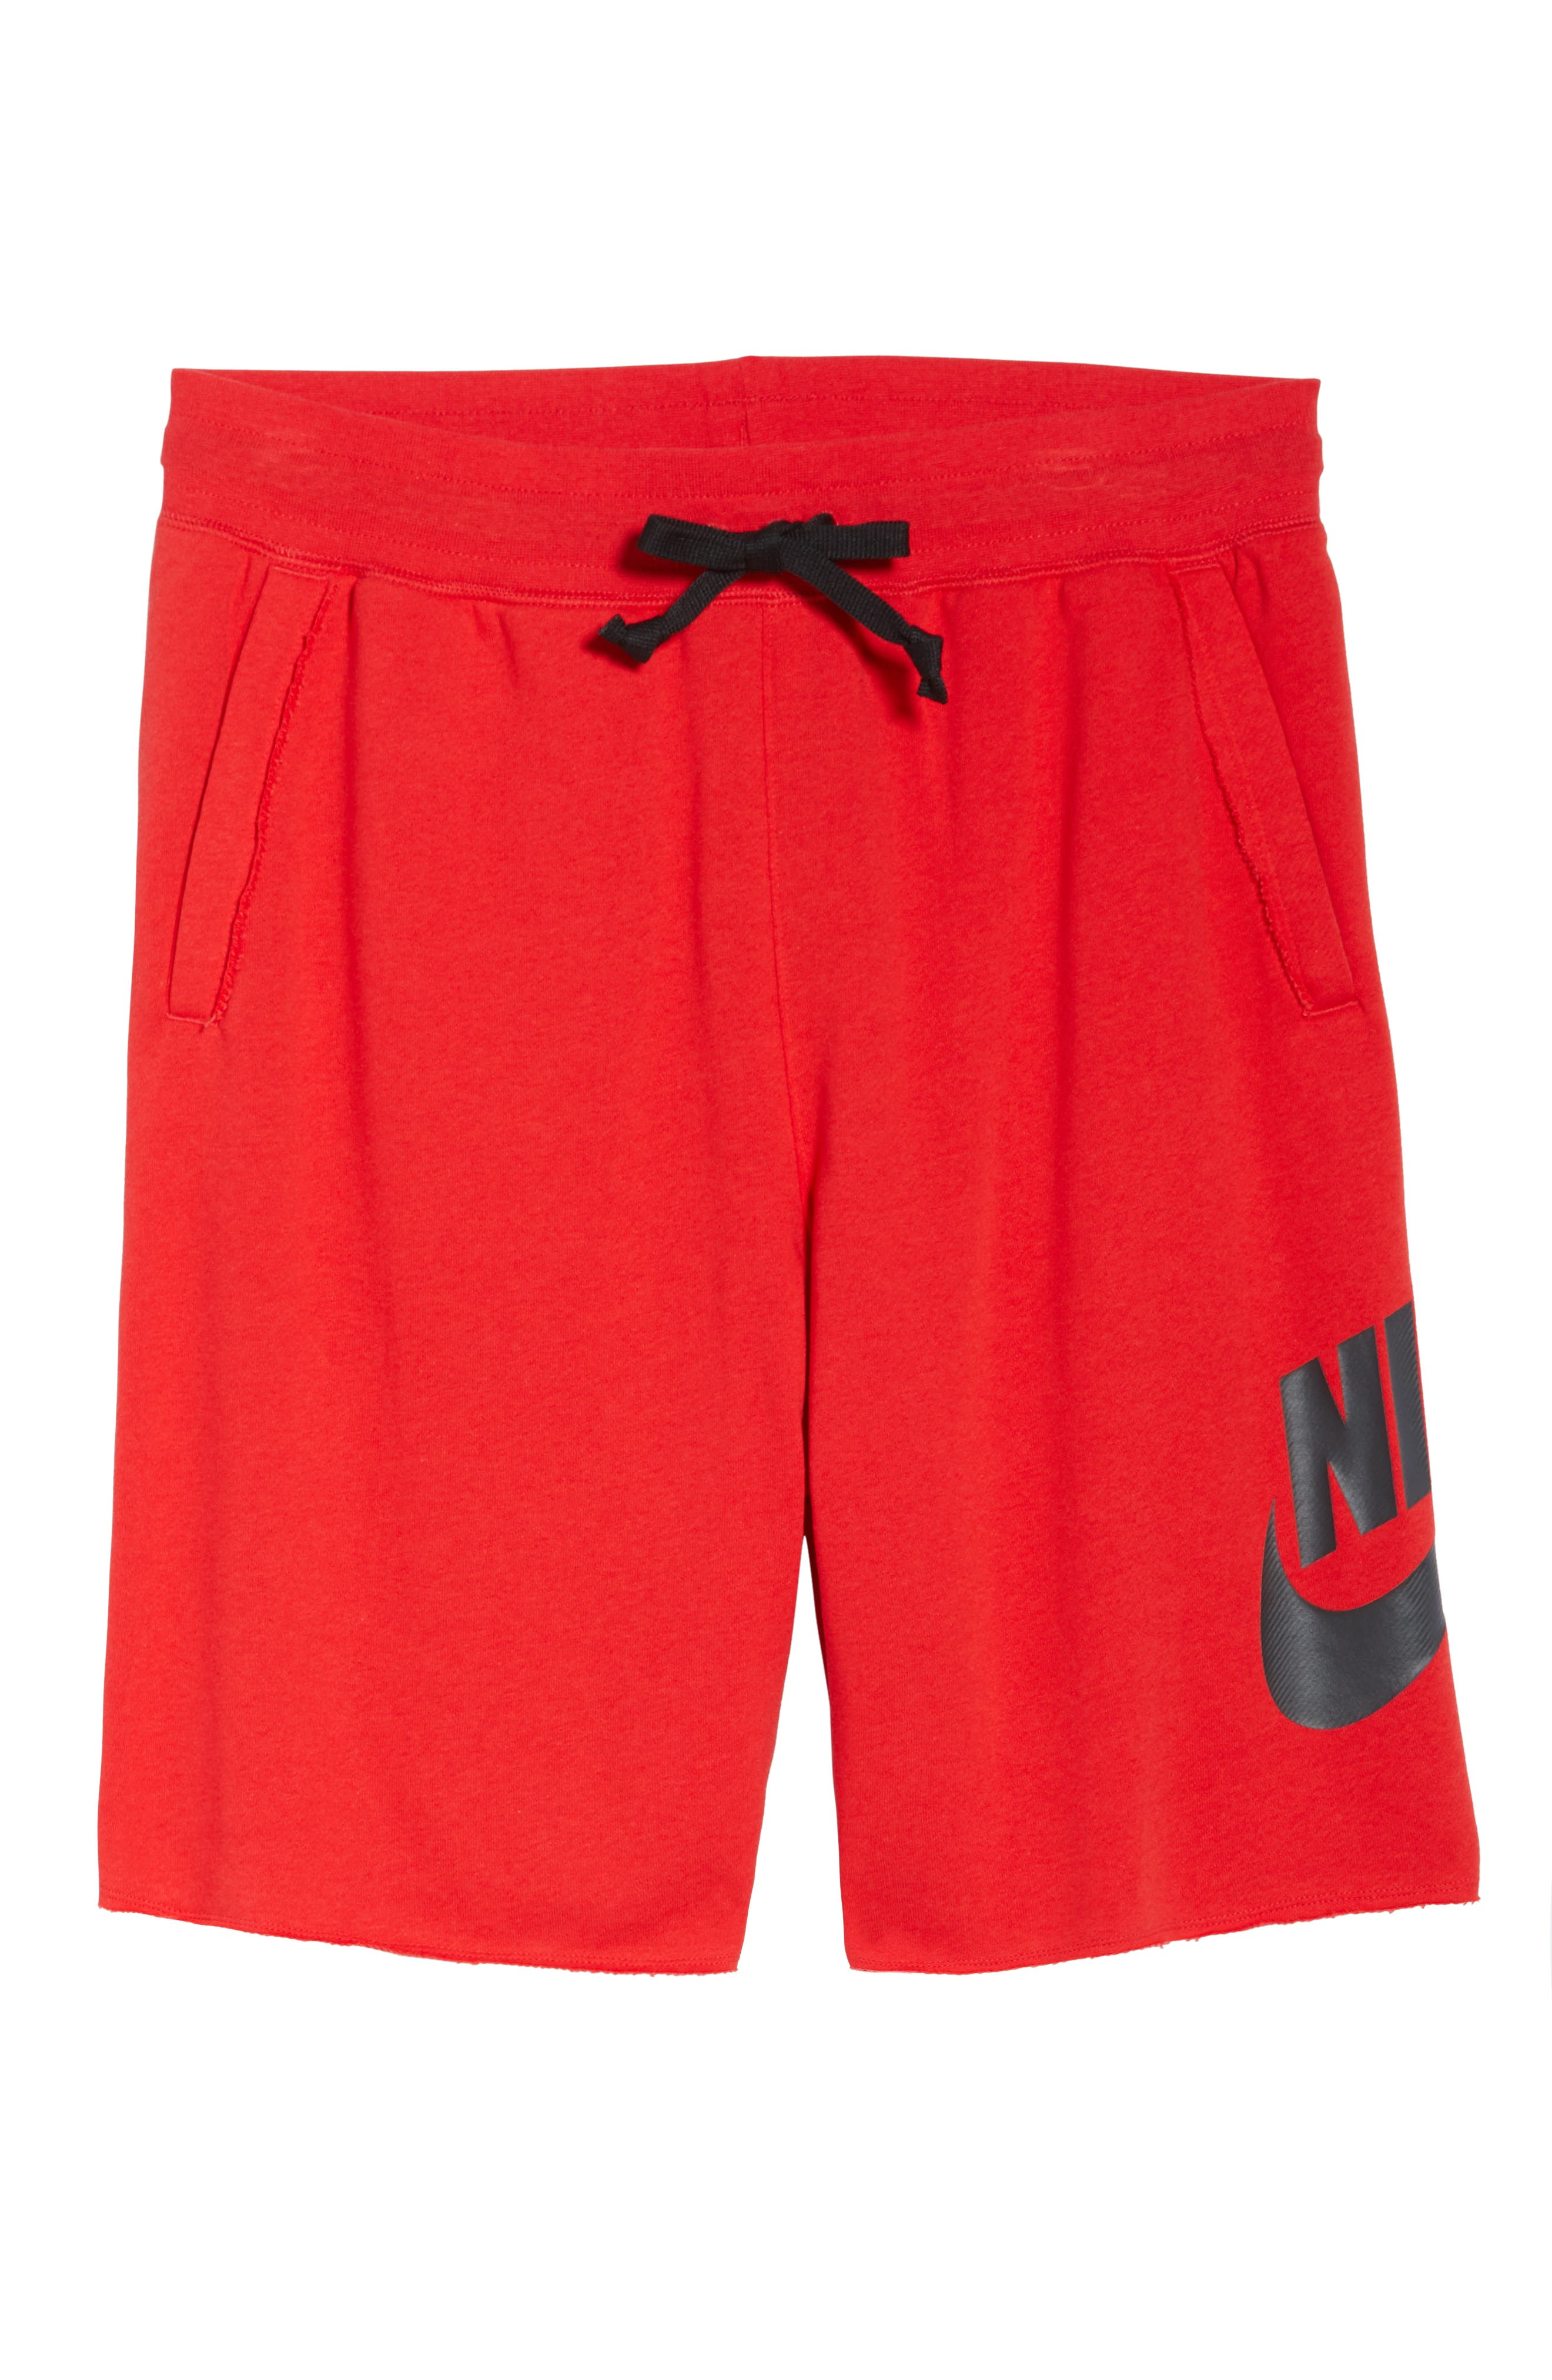 d7ead5f10ab Men's Nike Clothing | Nordstrom